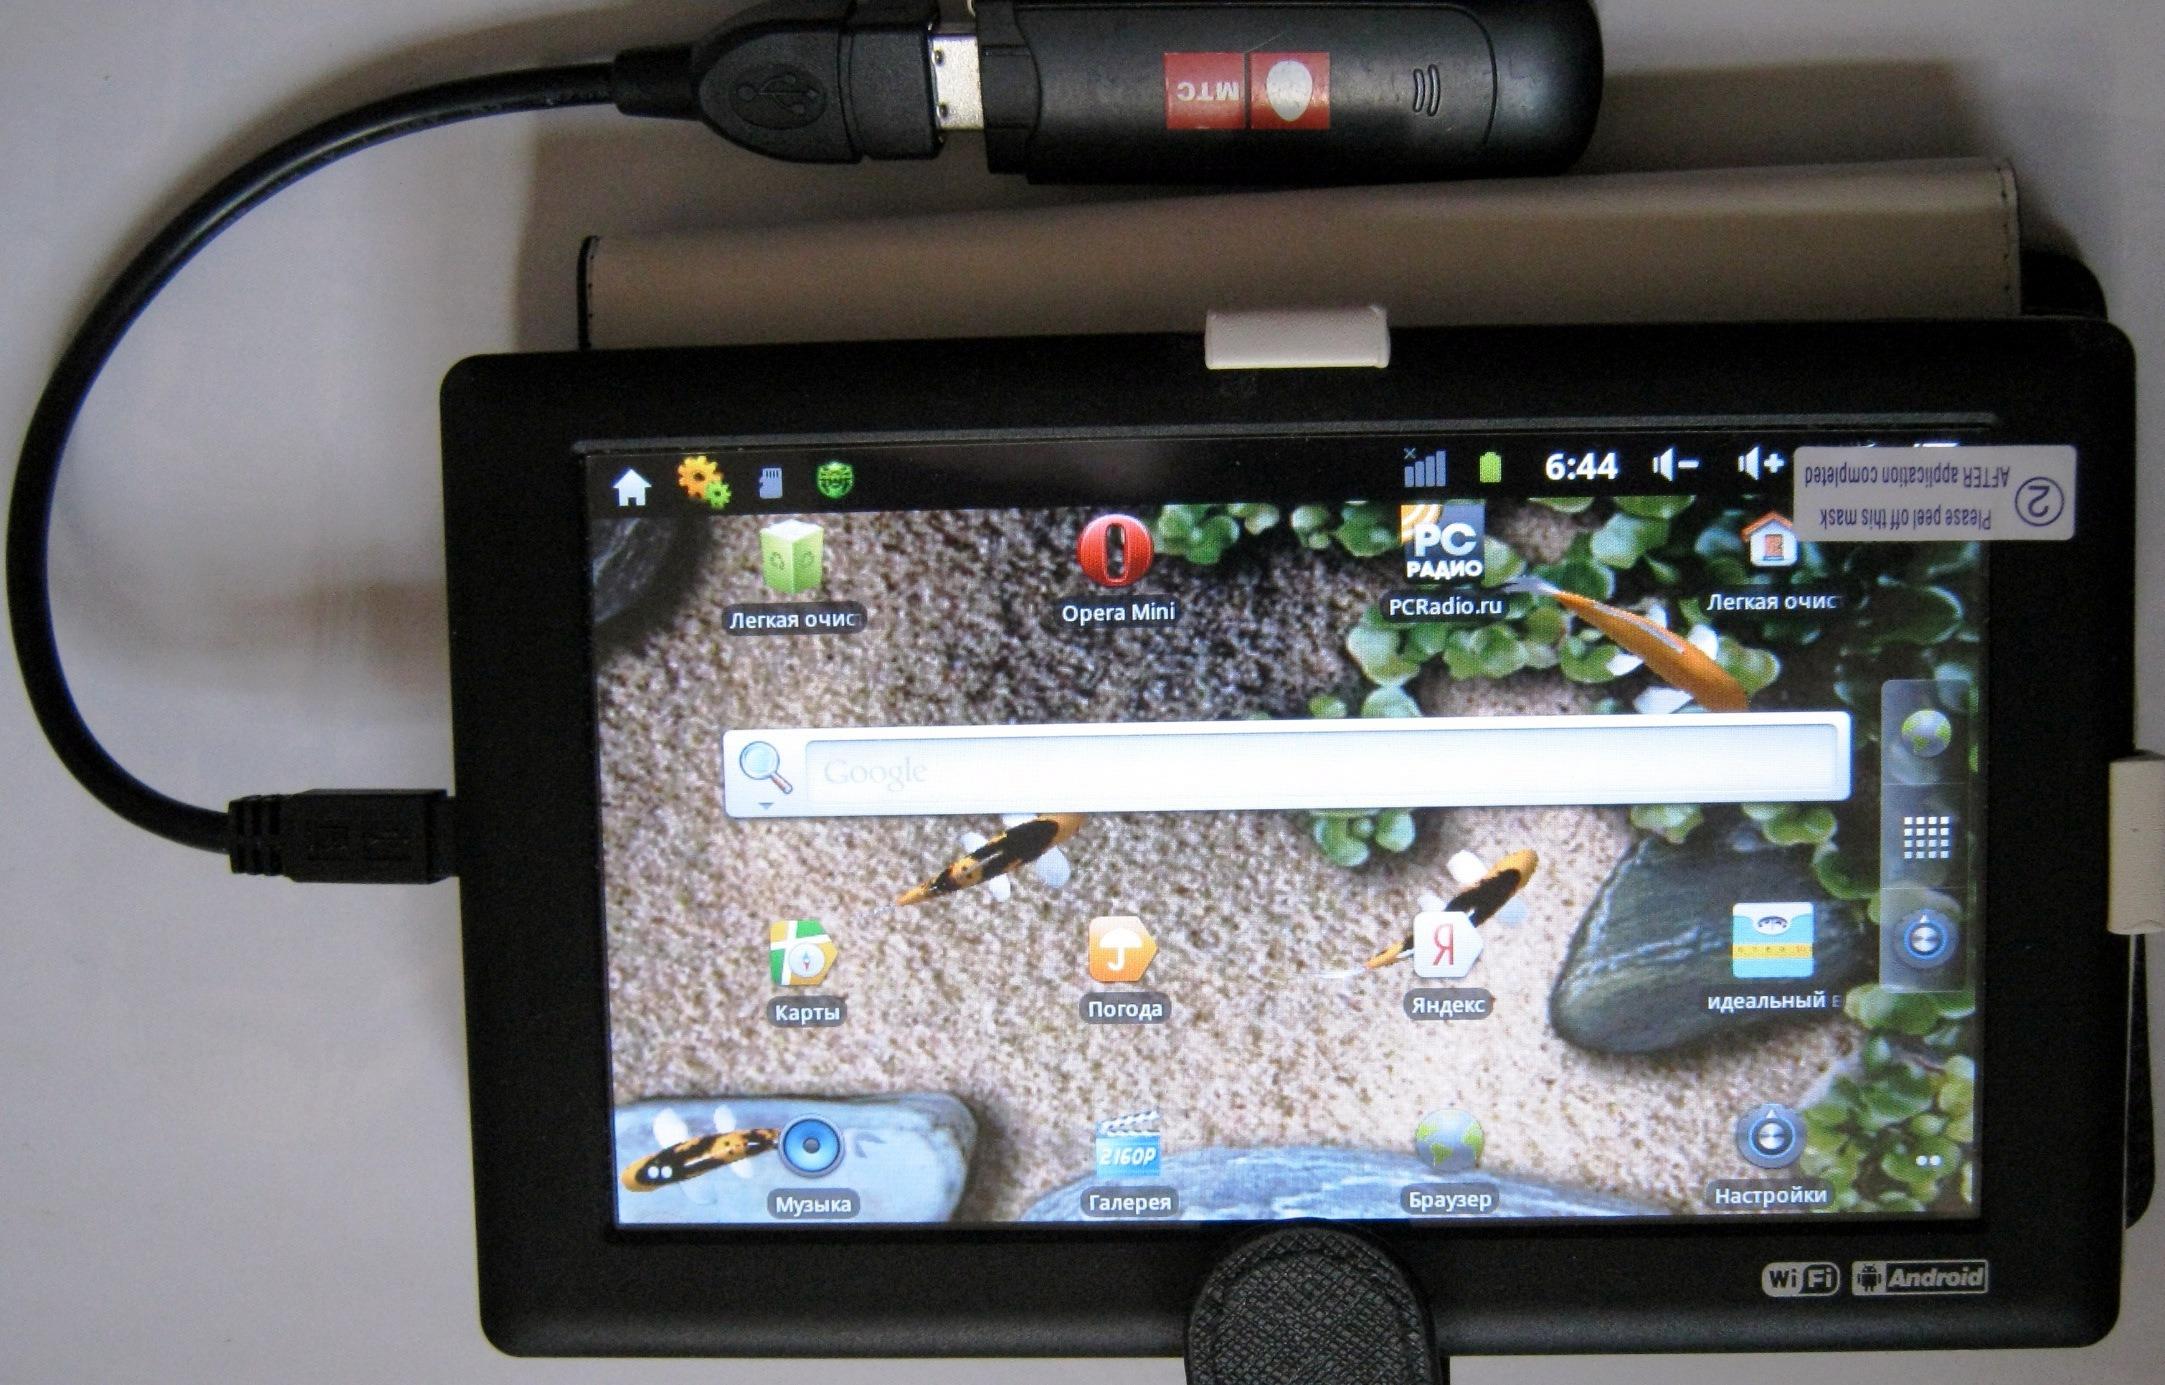 Скачать 3g модем на андроид